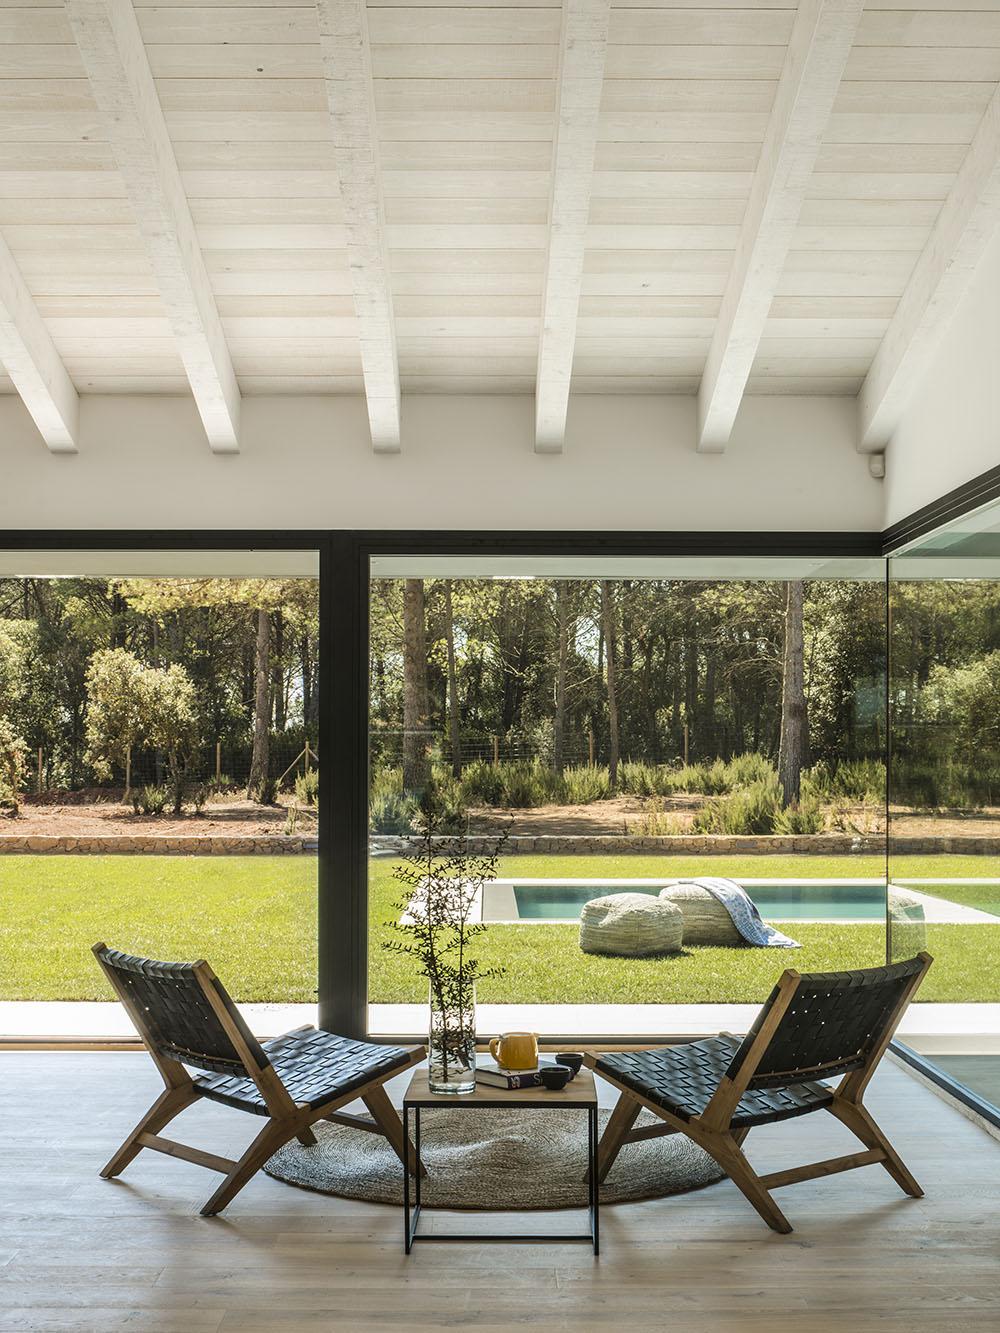 001 house woods susanna cots estudi de disseny homeadore